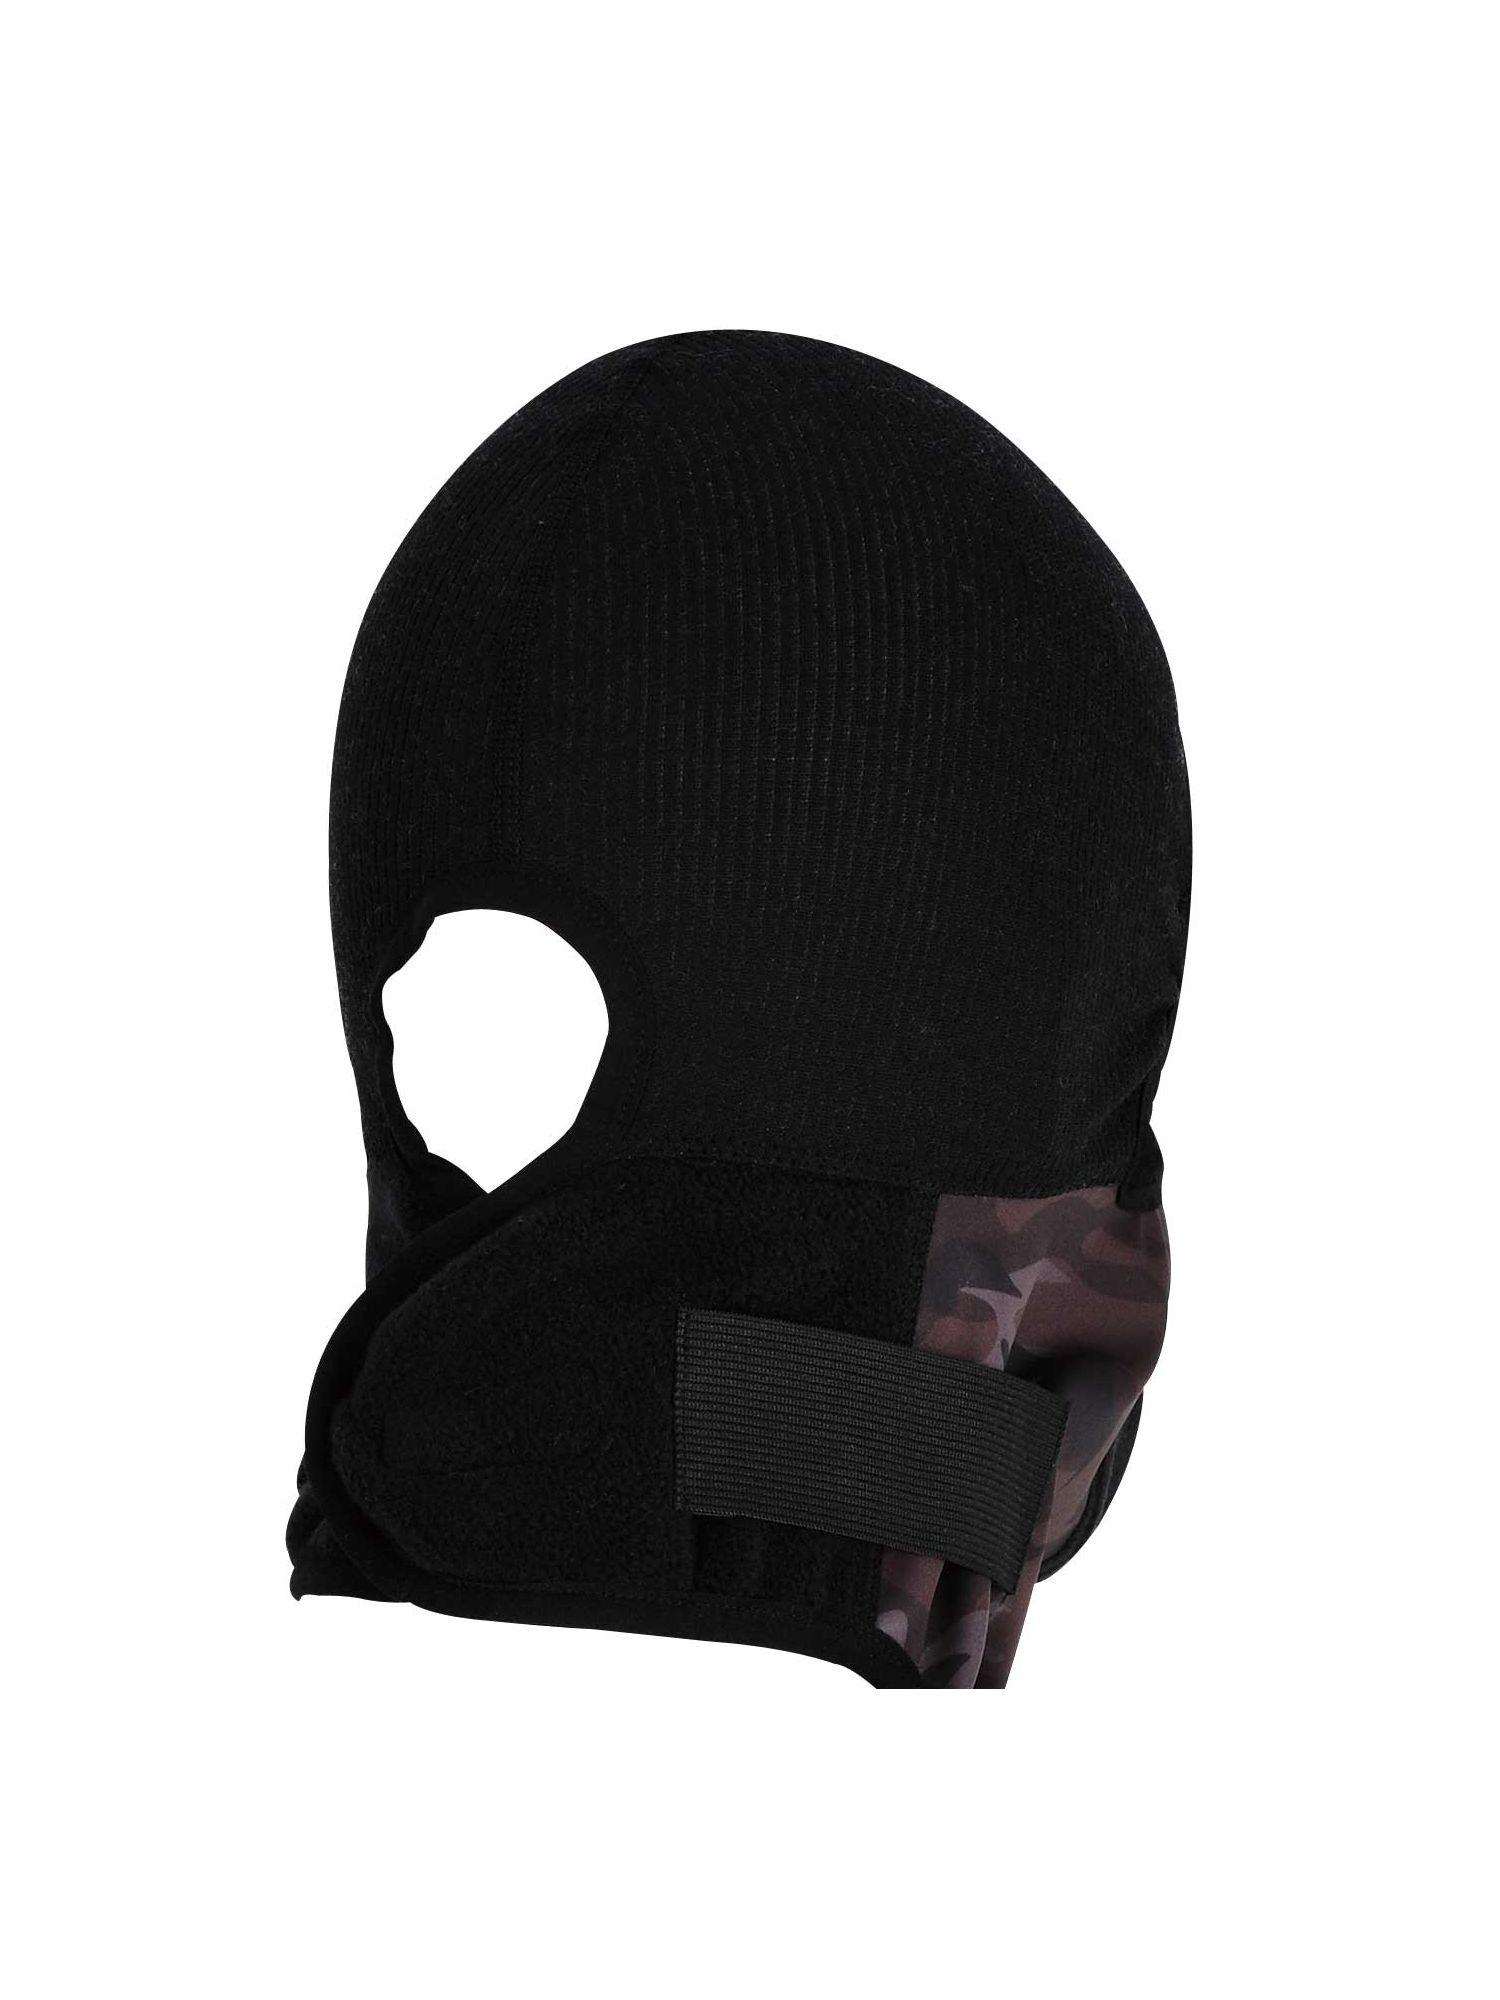 RSX155 | 防風 3D フルフェイス マスク[3colors]